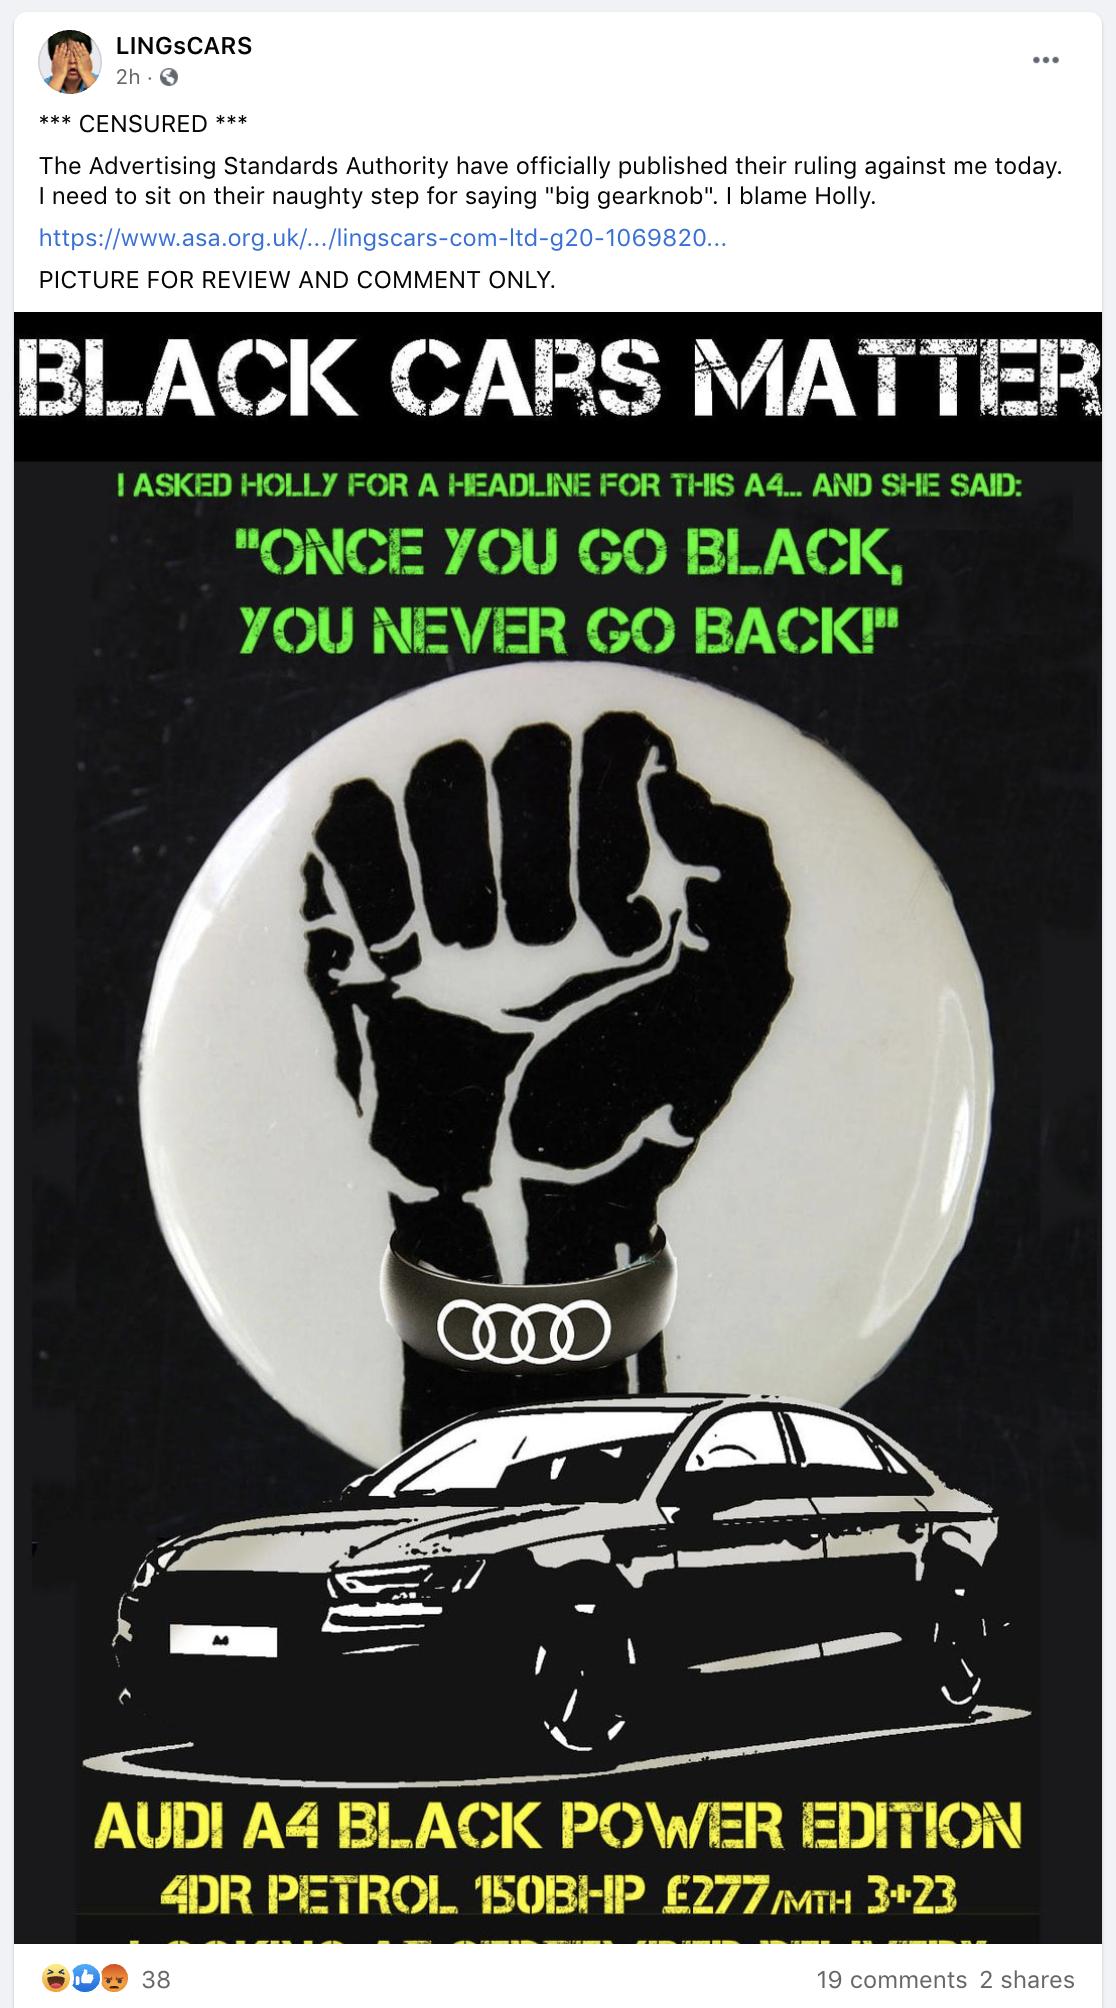 Black Cars Matters